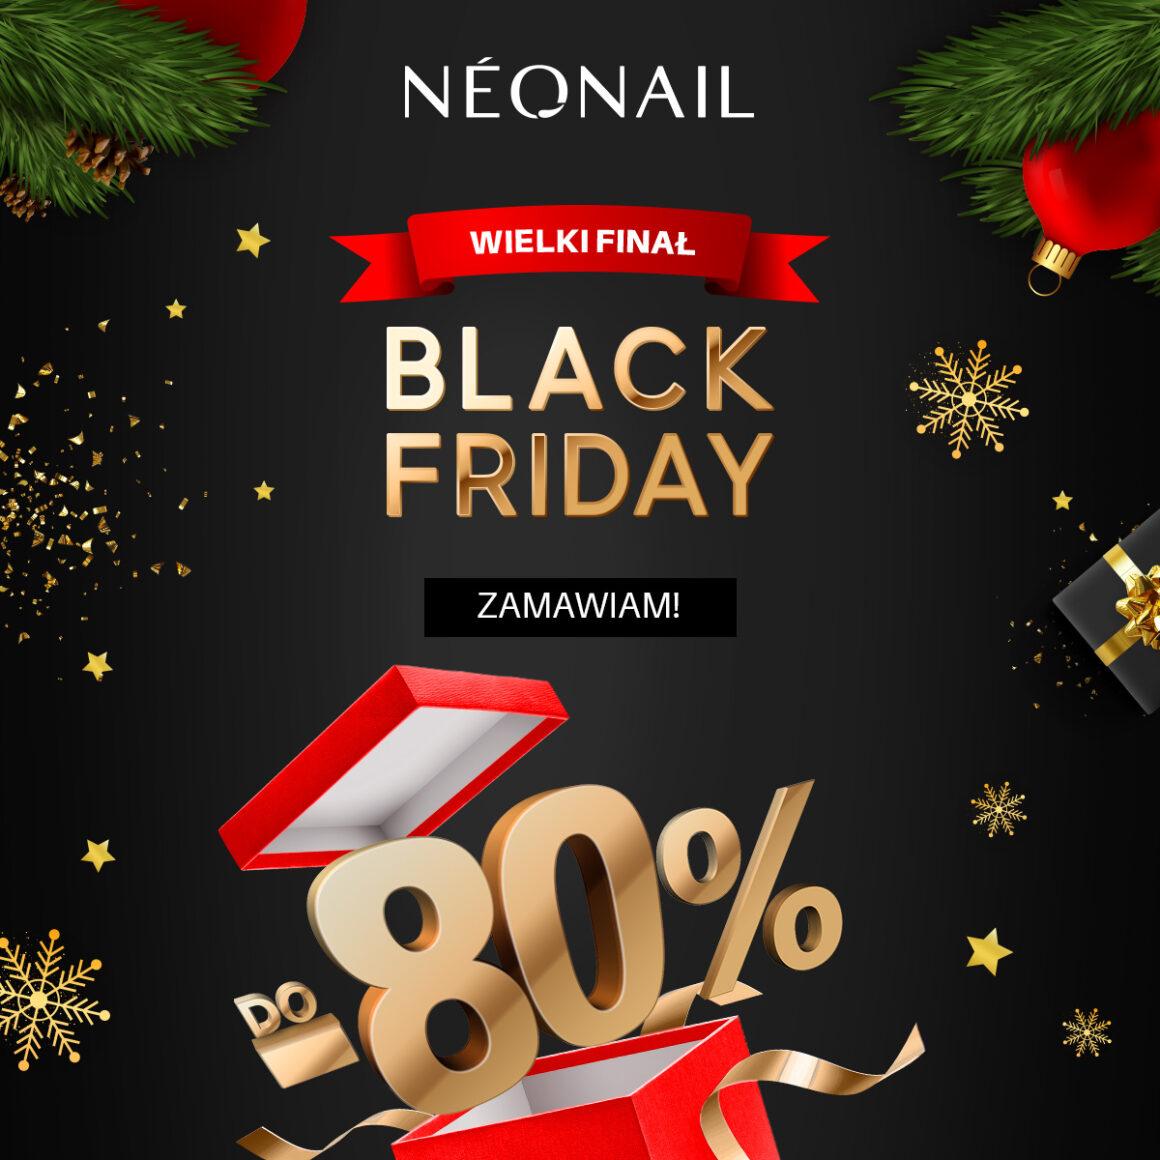 Promocja Black Friday od NEONAIL